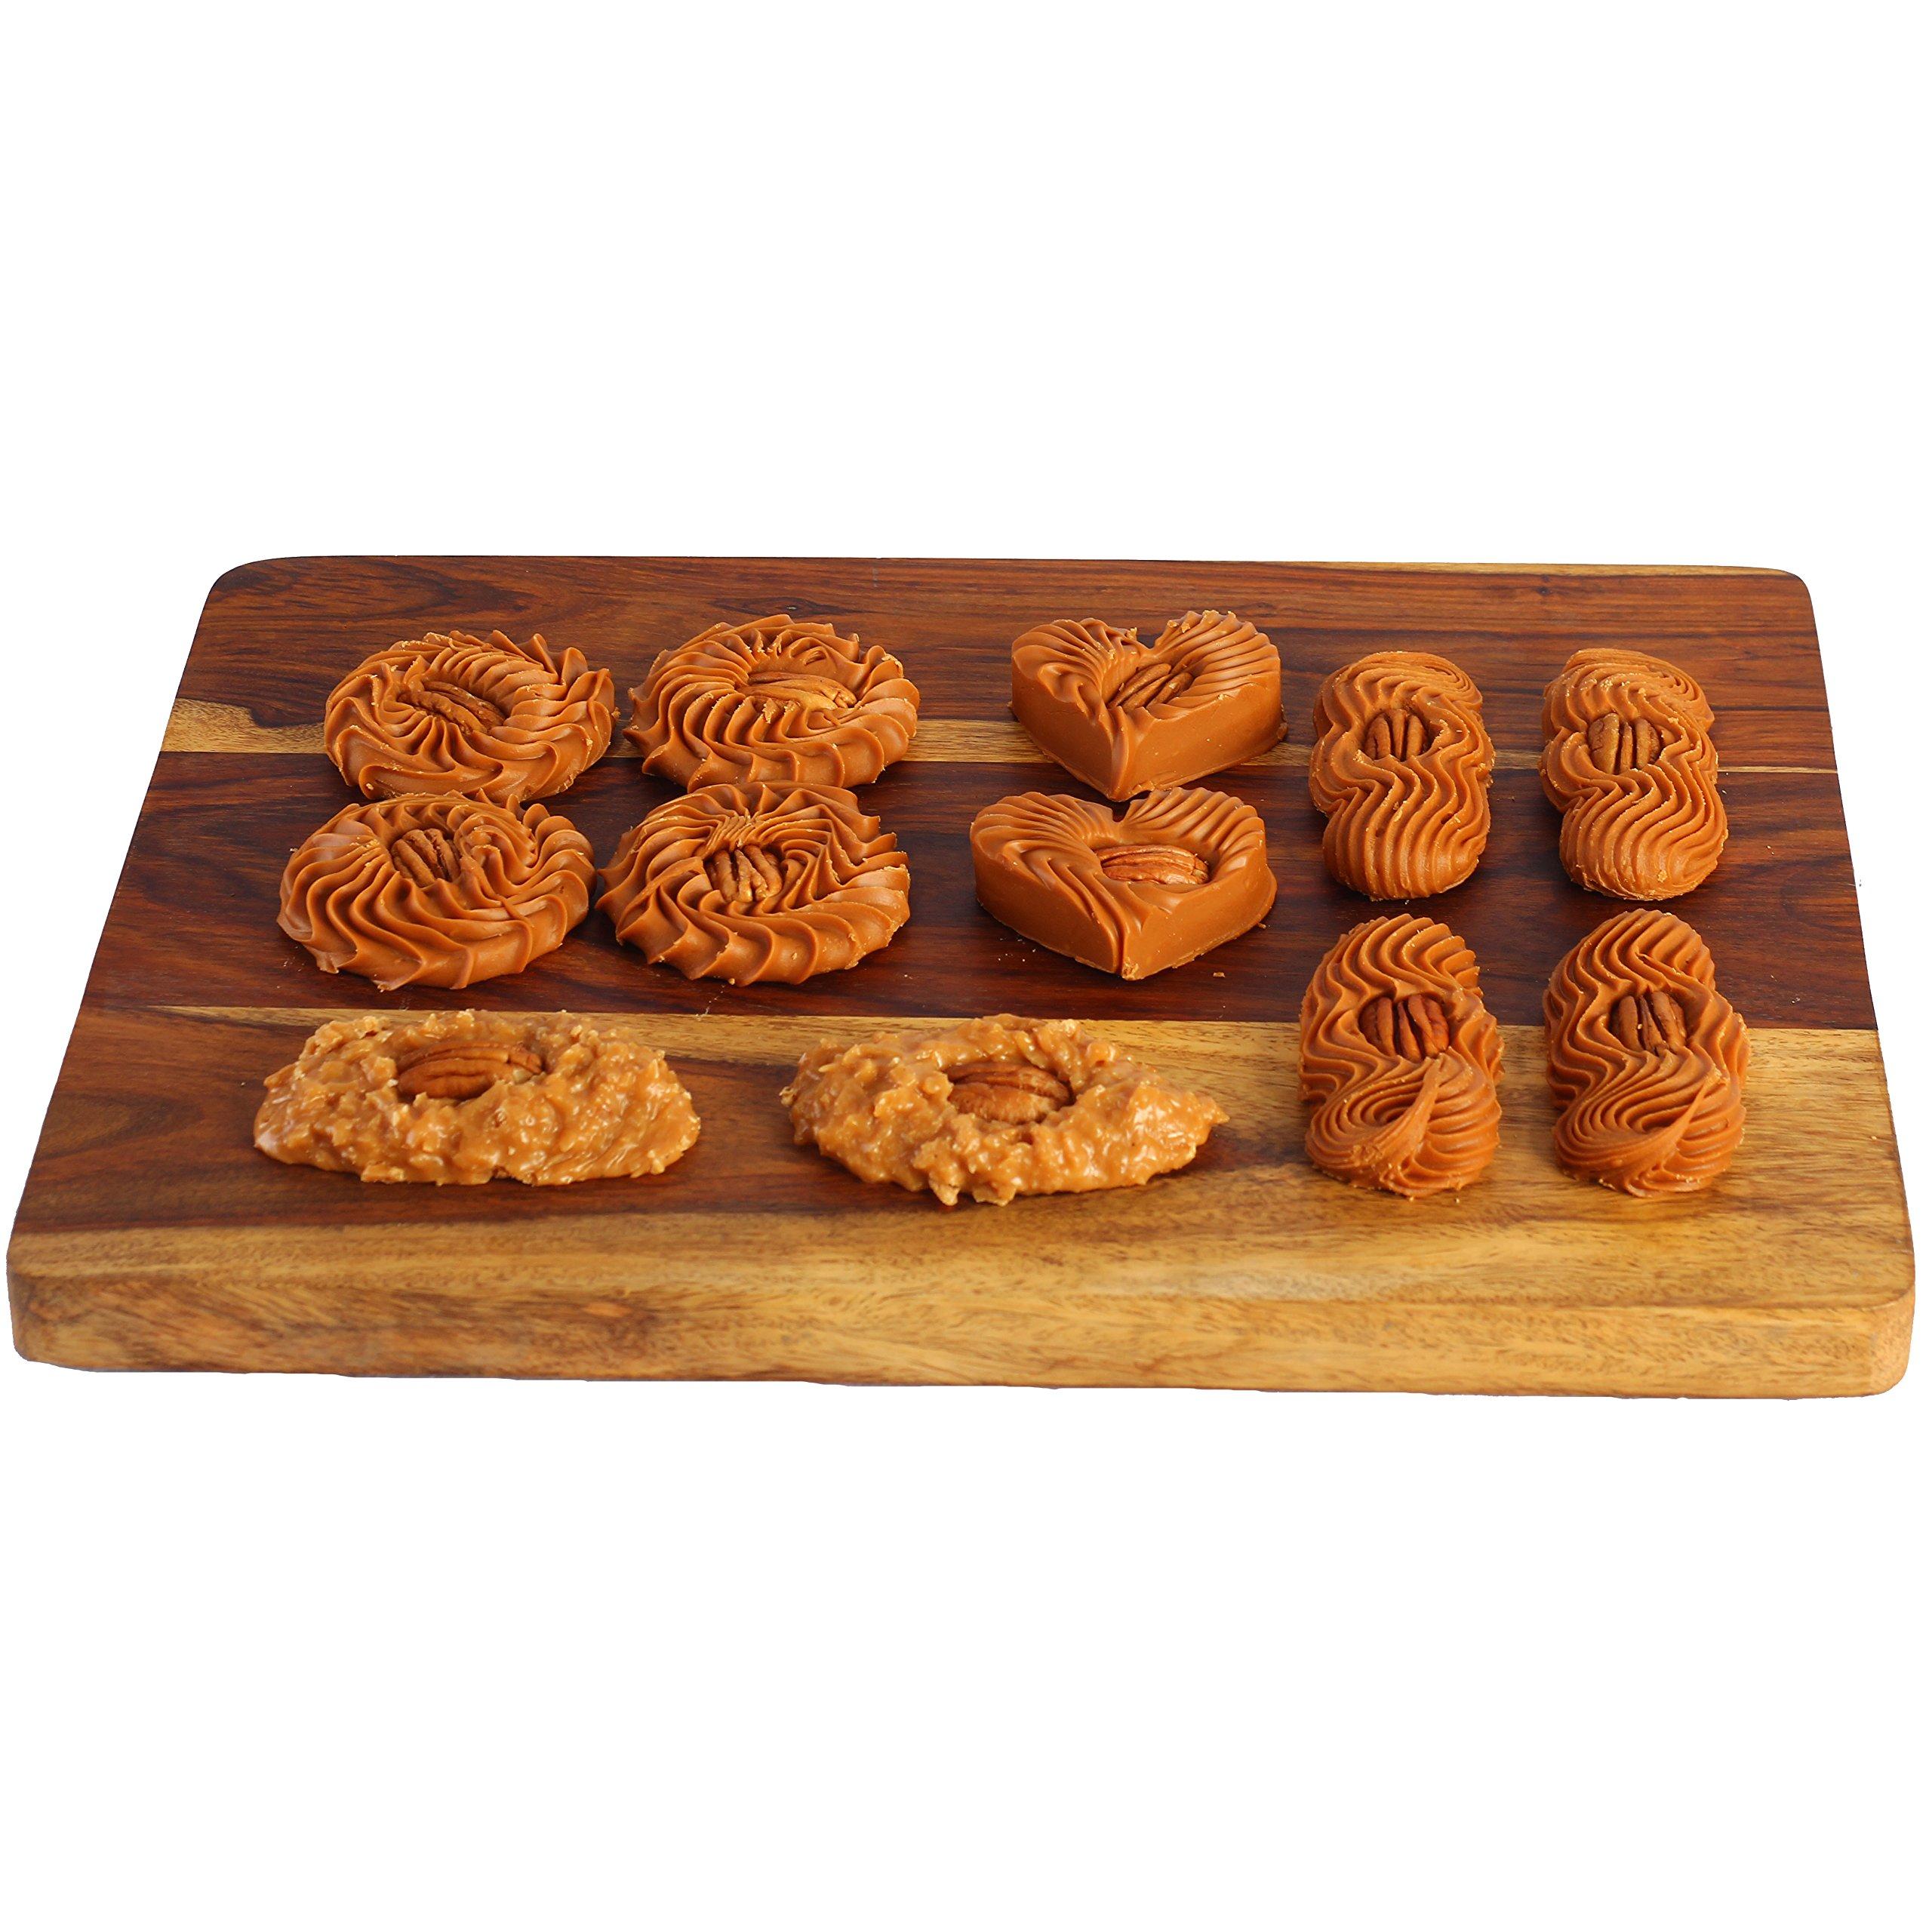 Yajua Candies: Jamoncillo Variety Box, Dulce De Leche Made Fresh in Texas [12 Pack]; 100%! by Yajua Candies, Inc.